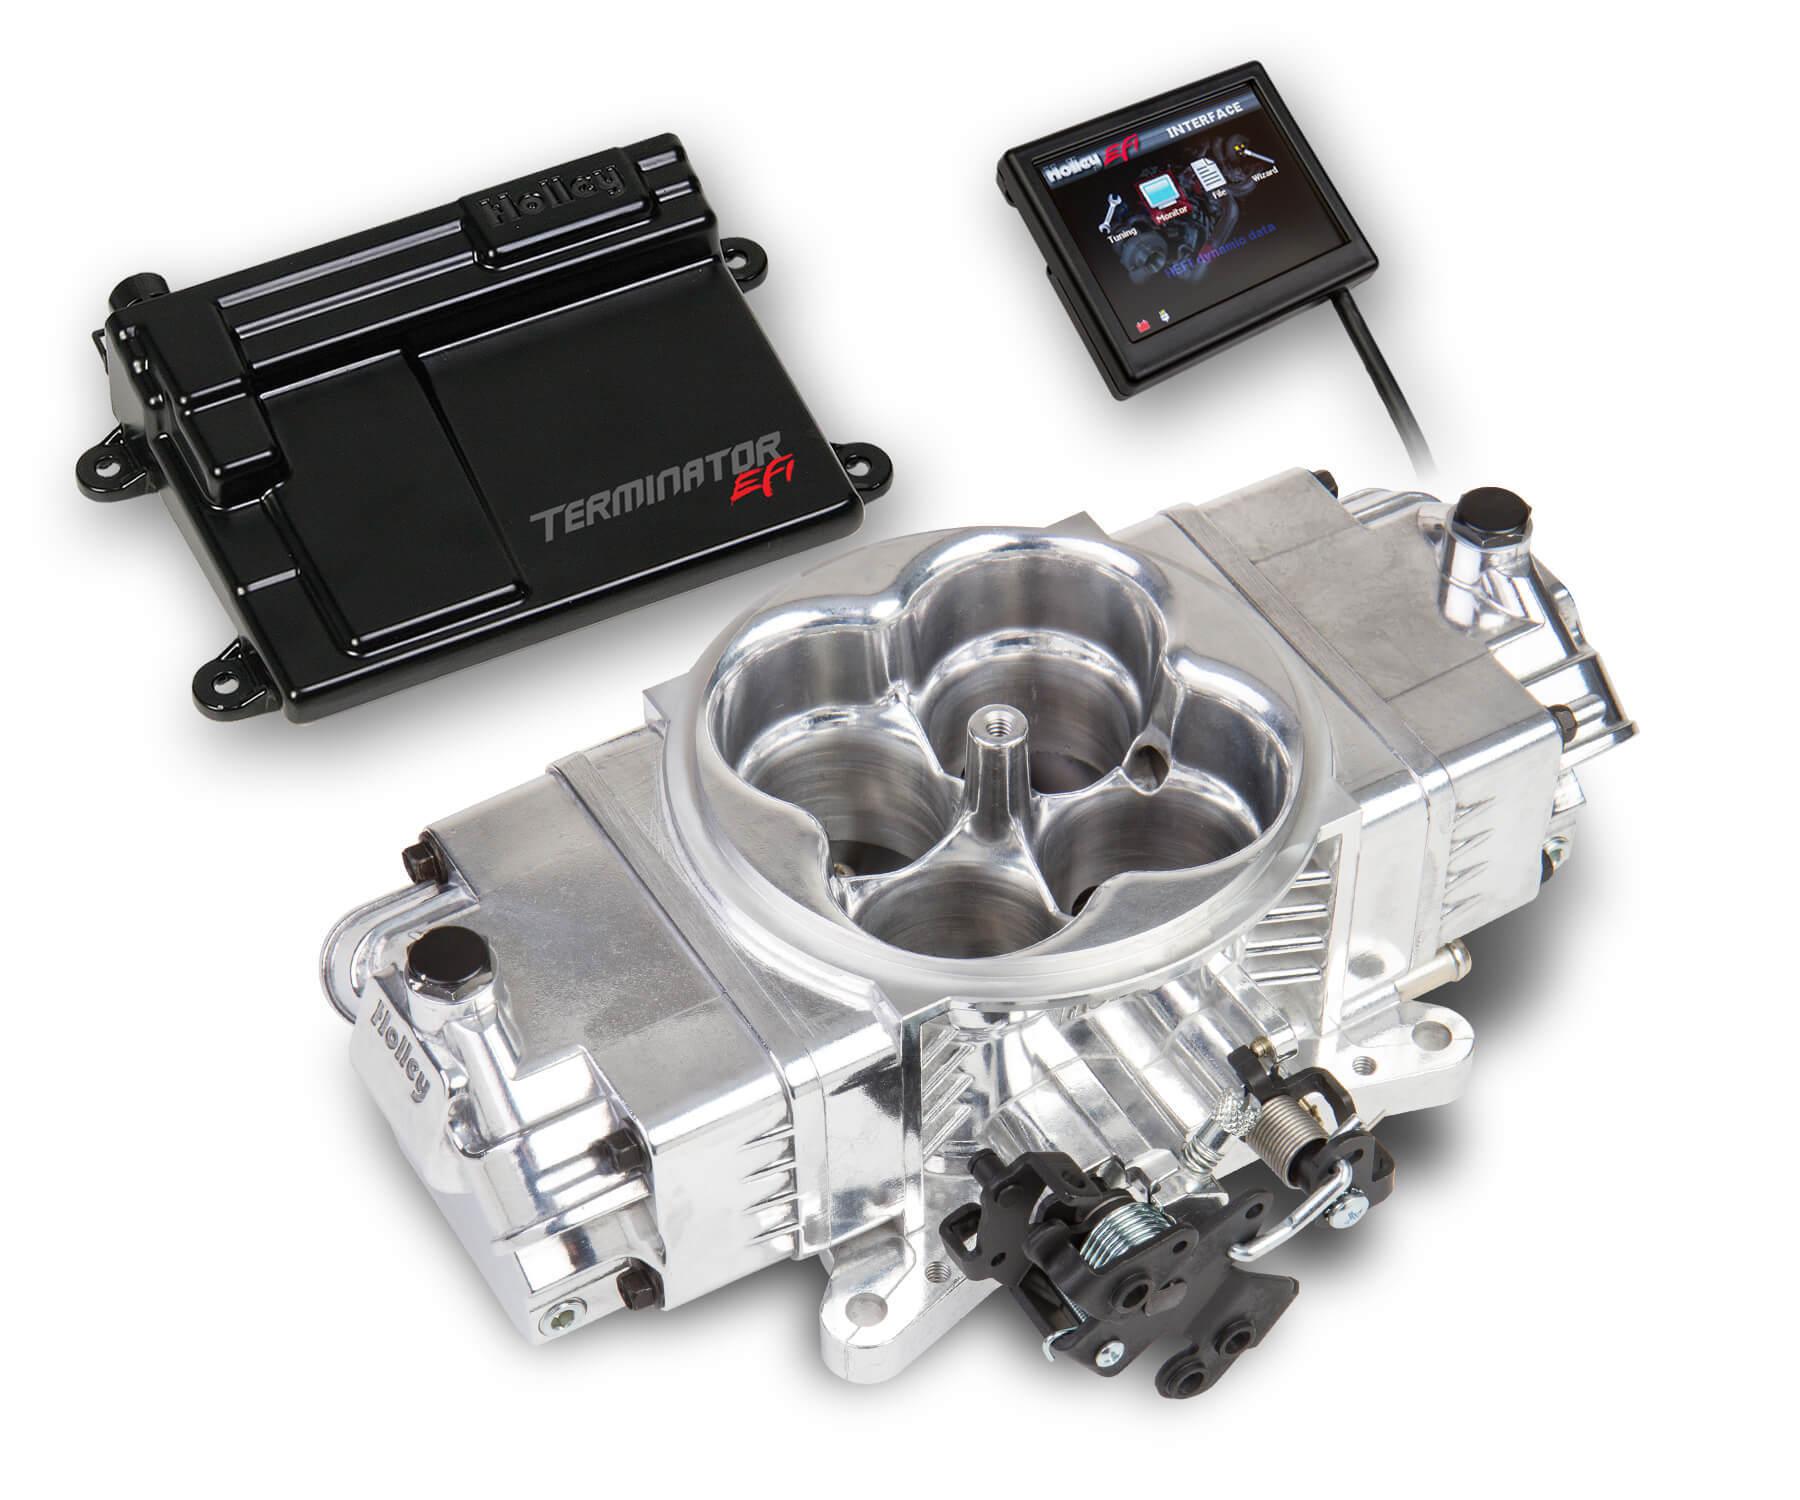 Holley 550-440K Fuel Injection, Terminator Stealth EFI Master, Throttle Body, Square Bore, Fuel Pump / Filter / Hose / Regulator / Fittings, Aluminum, Polished, Kit